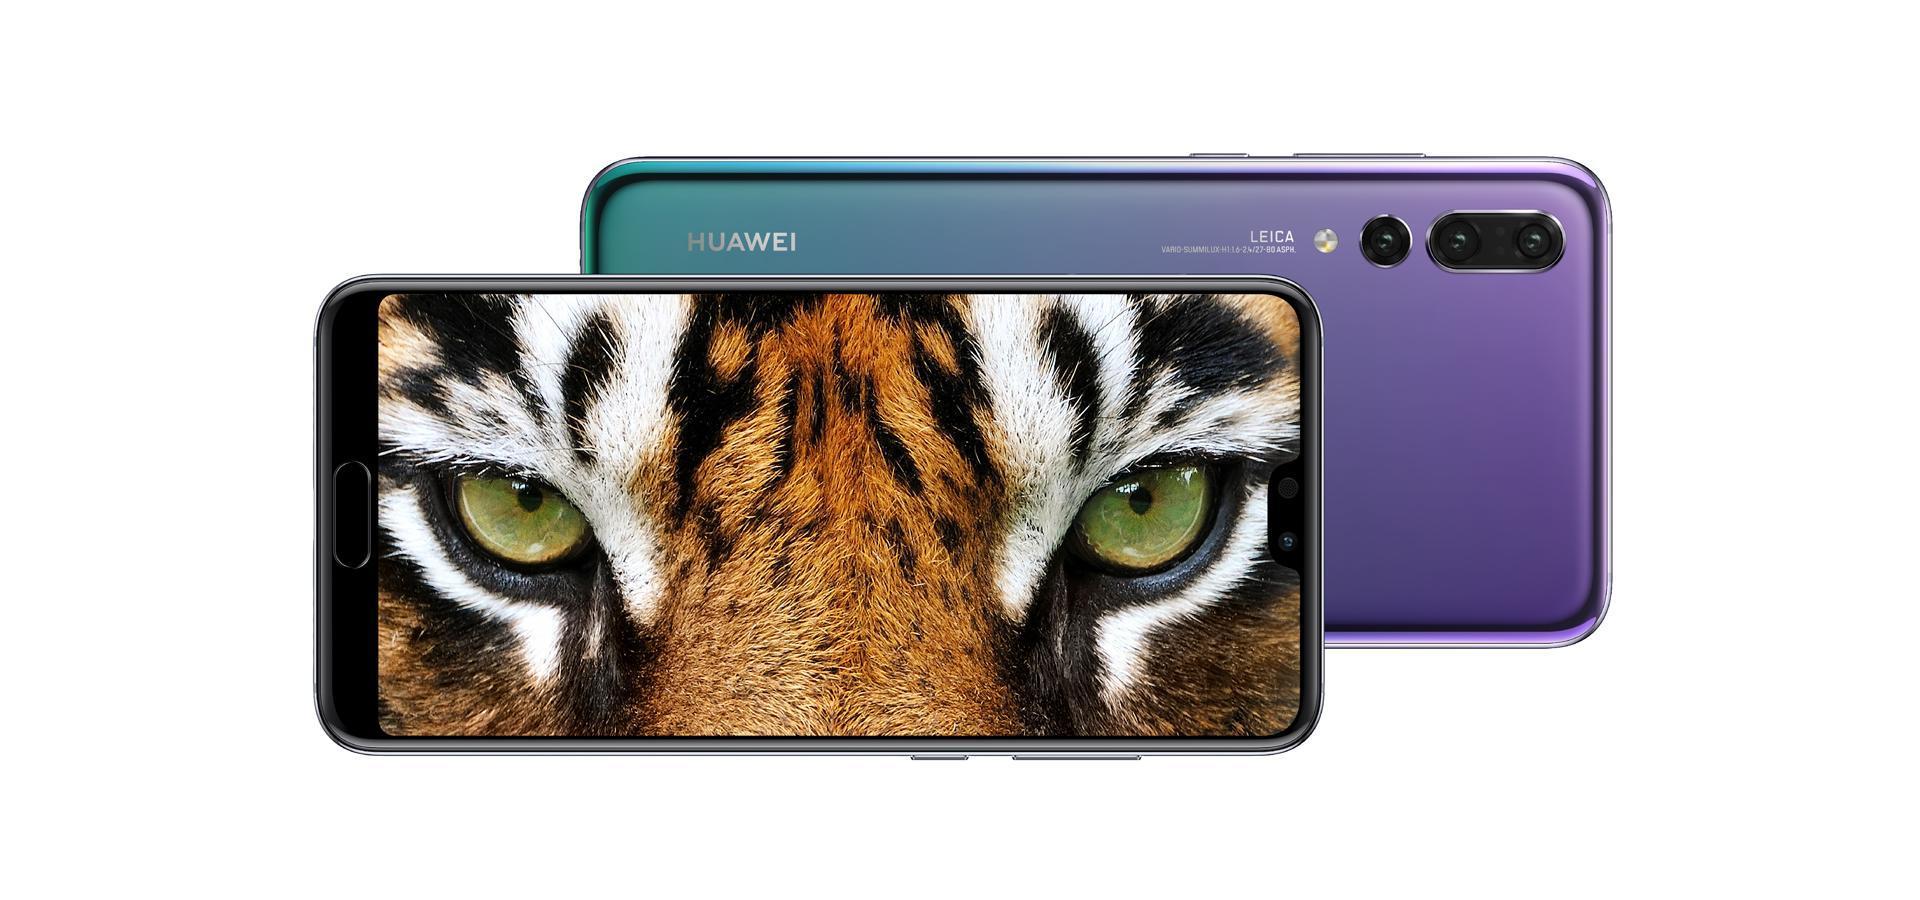 HUAWEI P20 Pro Smartphone, Leica Triple Camera, FullView Display